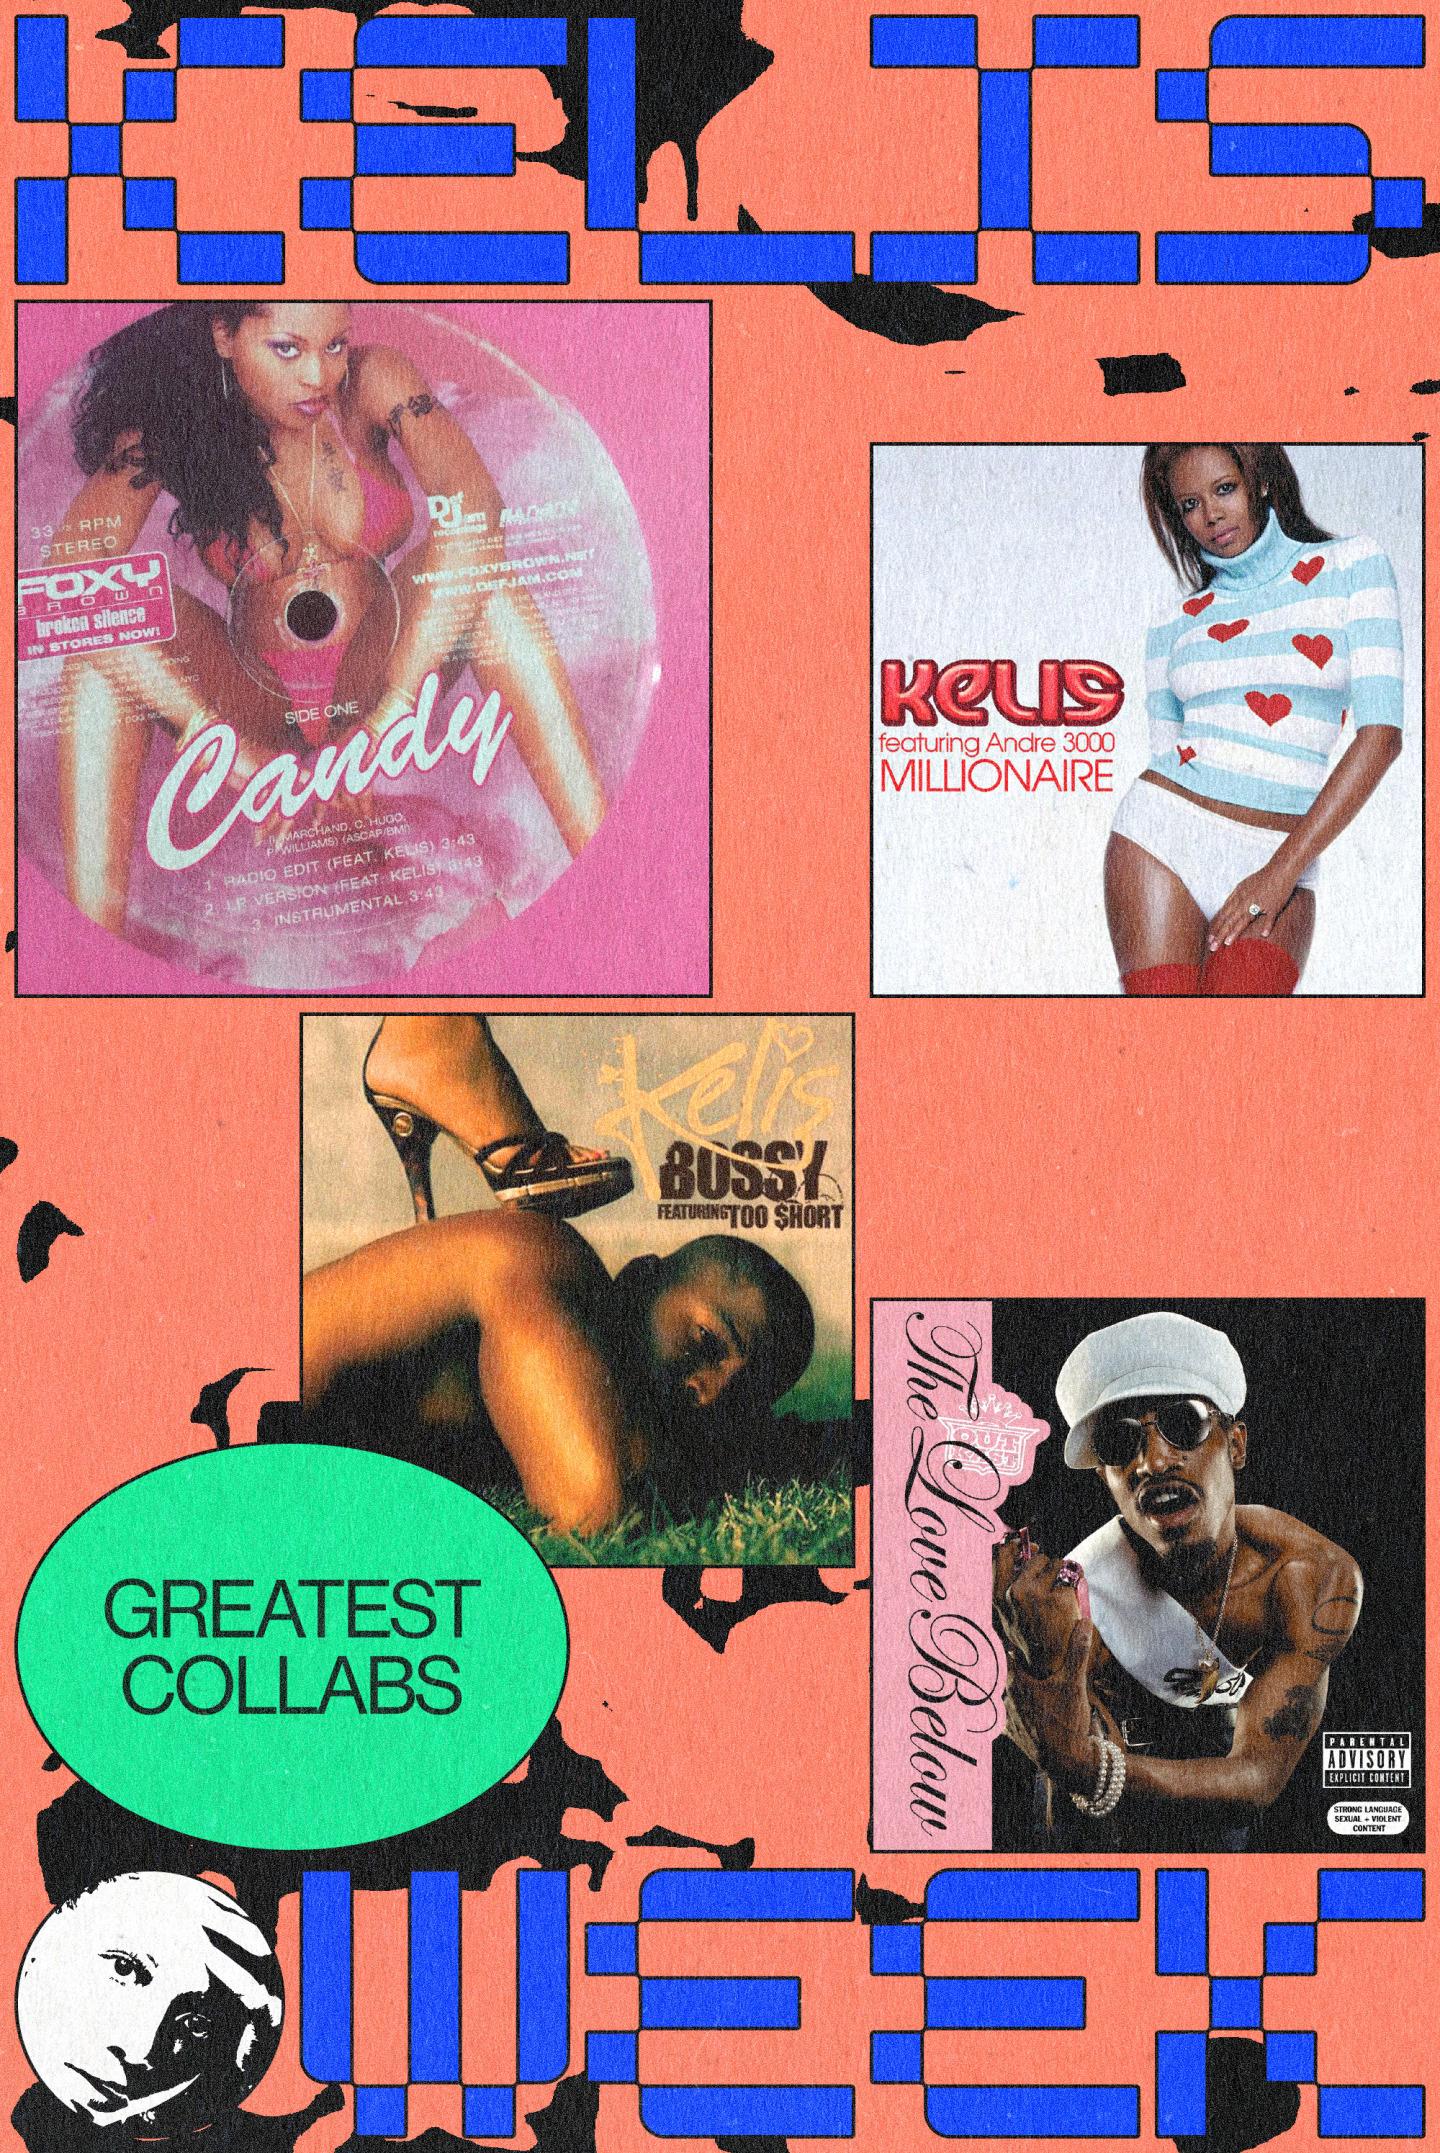 10 perfect Kelis collaborations